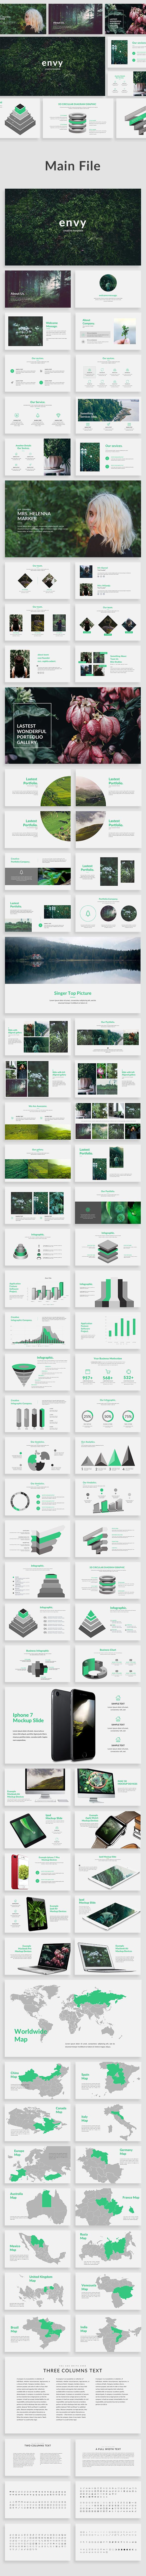 Envy - Creative Powerpoint Template - Creative PowerPoint Templates